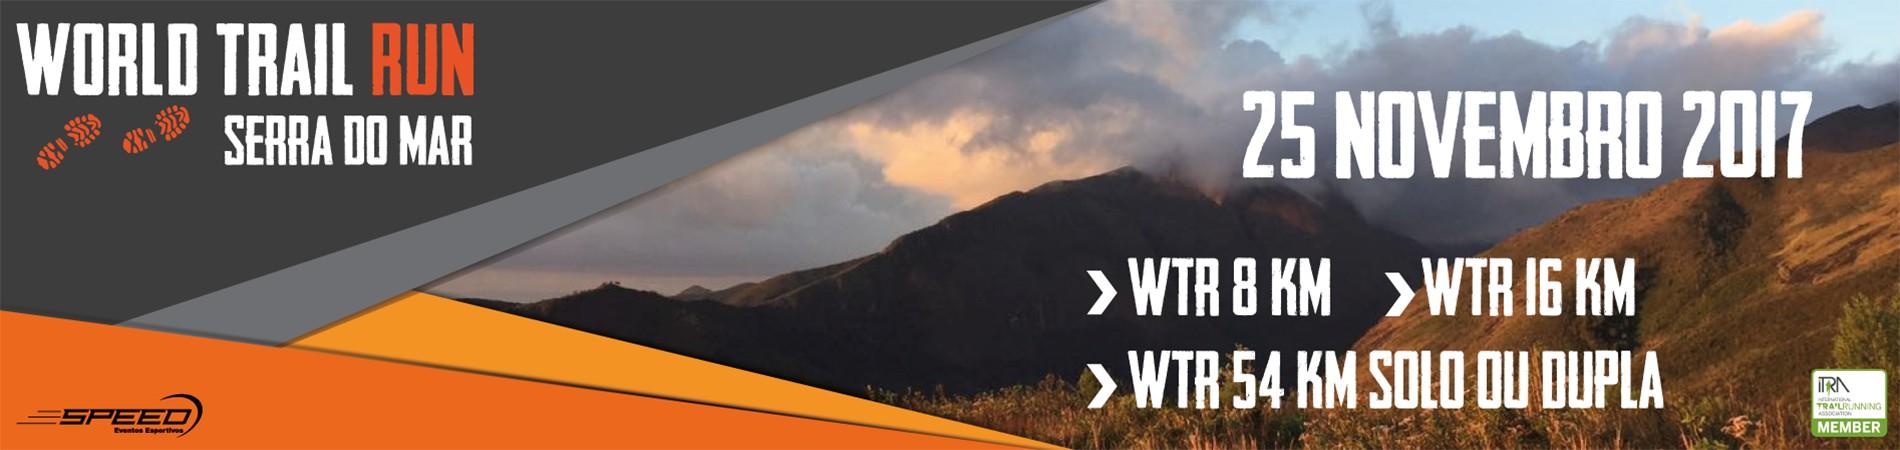 WORLD TRAIL RUN - WTR SERRA DO MAR - Imagem de topo